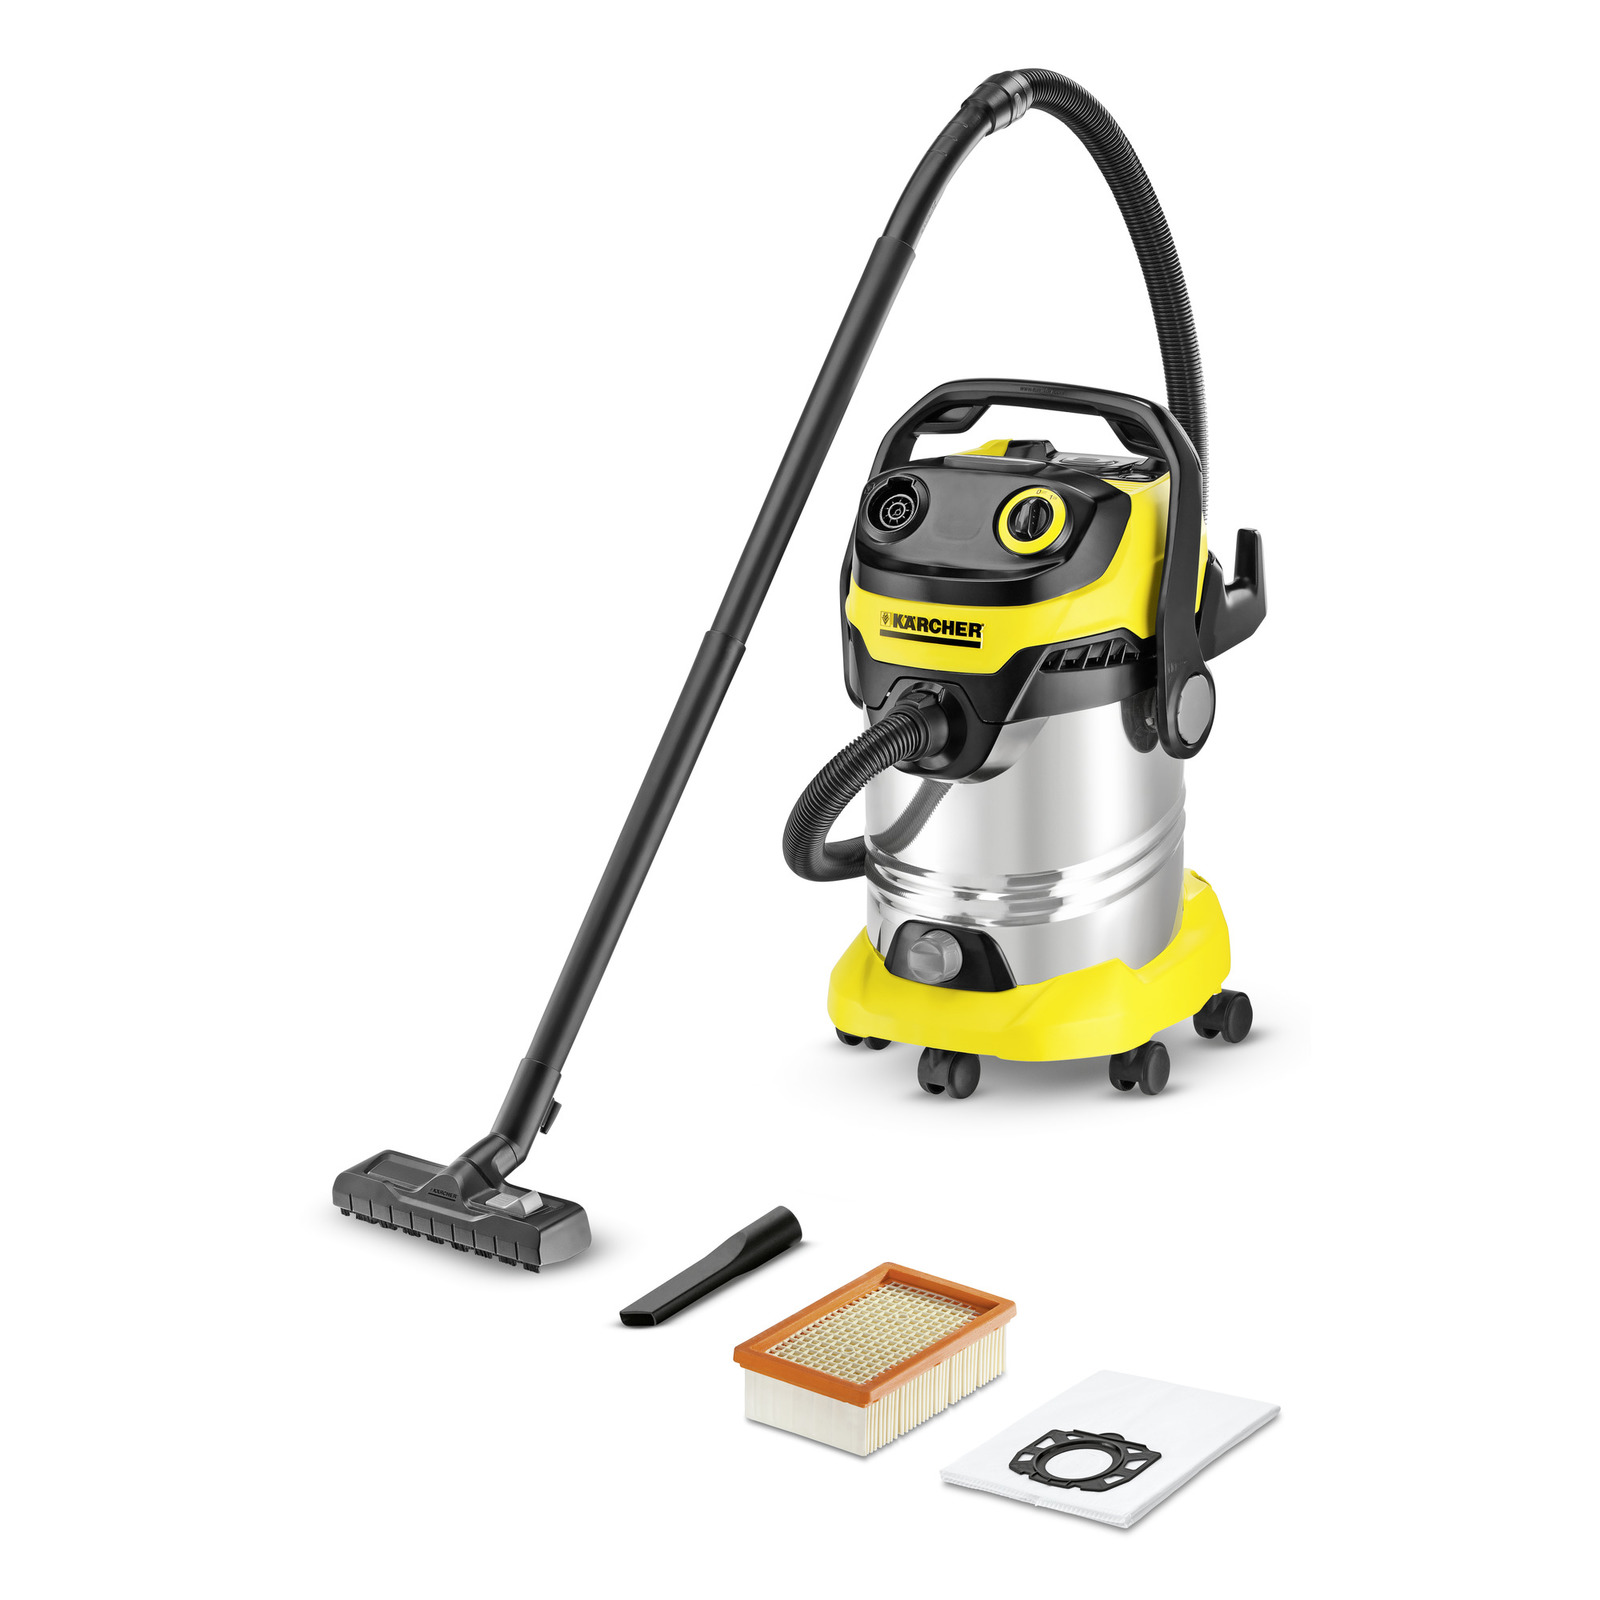 wet dry vacuum cleaner wd 5 premium karcher australia. Black Bedroom Furniture Sets. Home Design Ideas